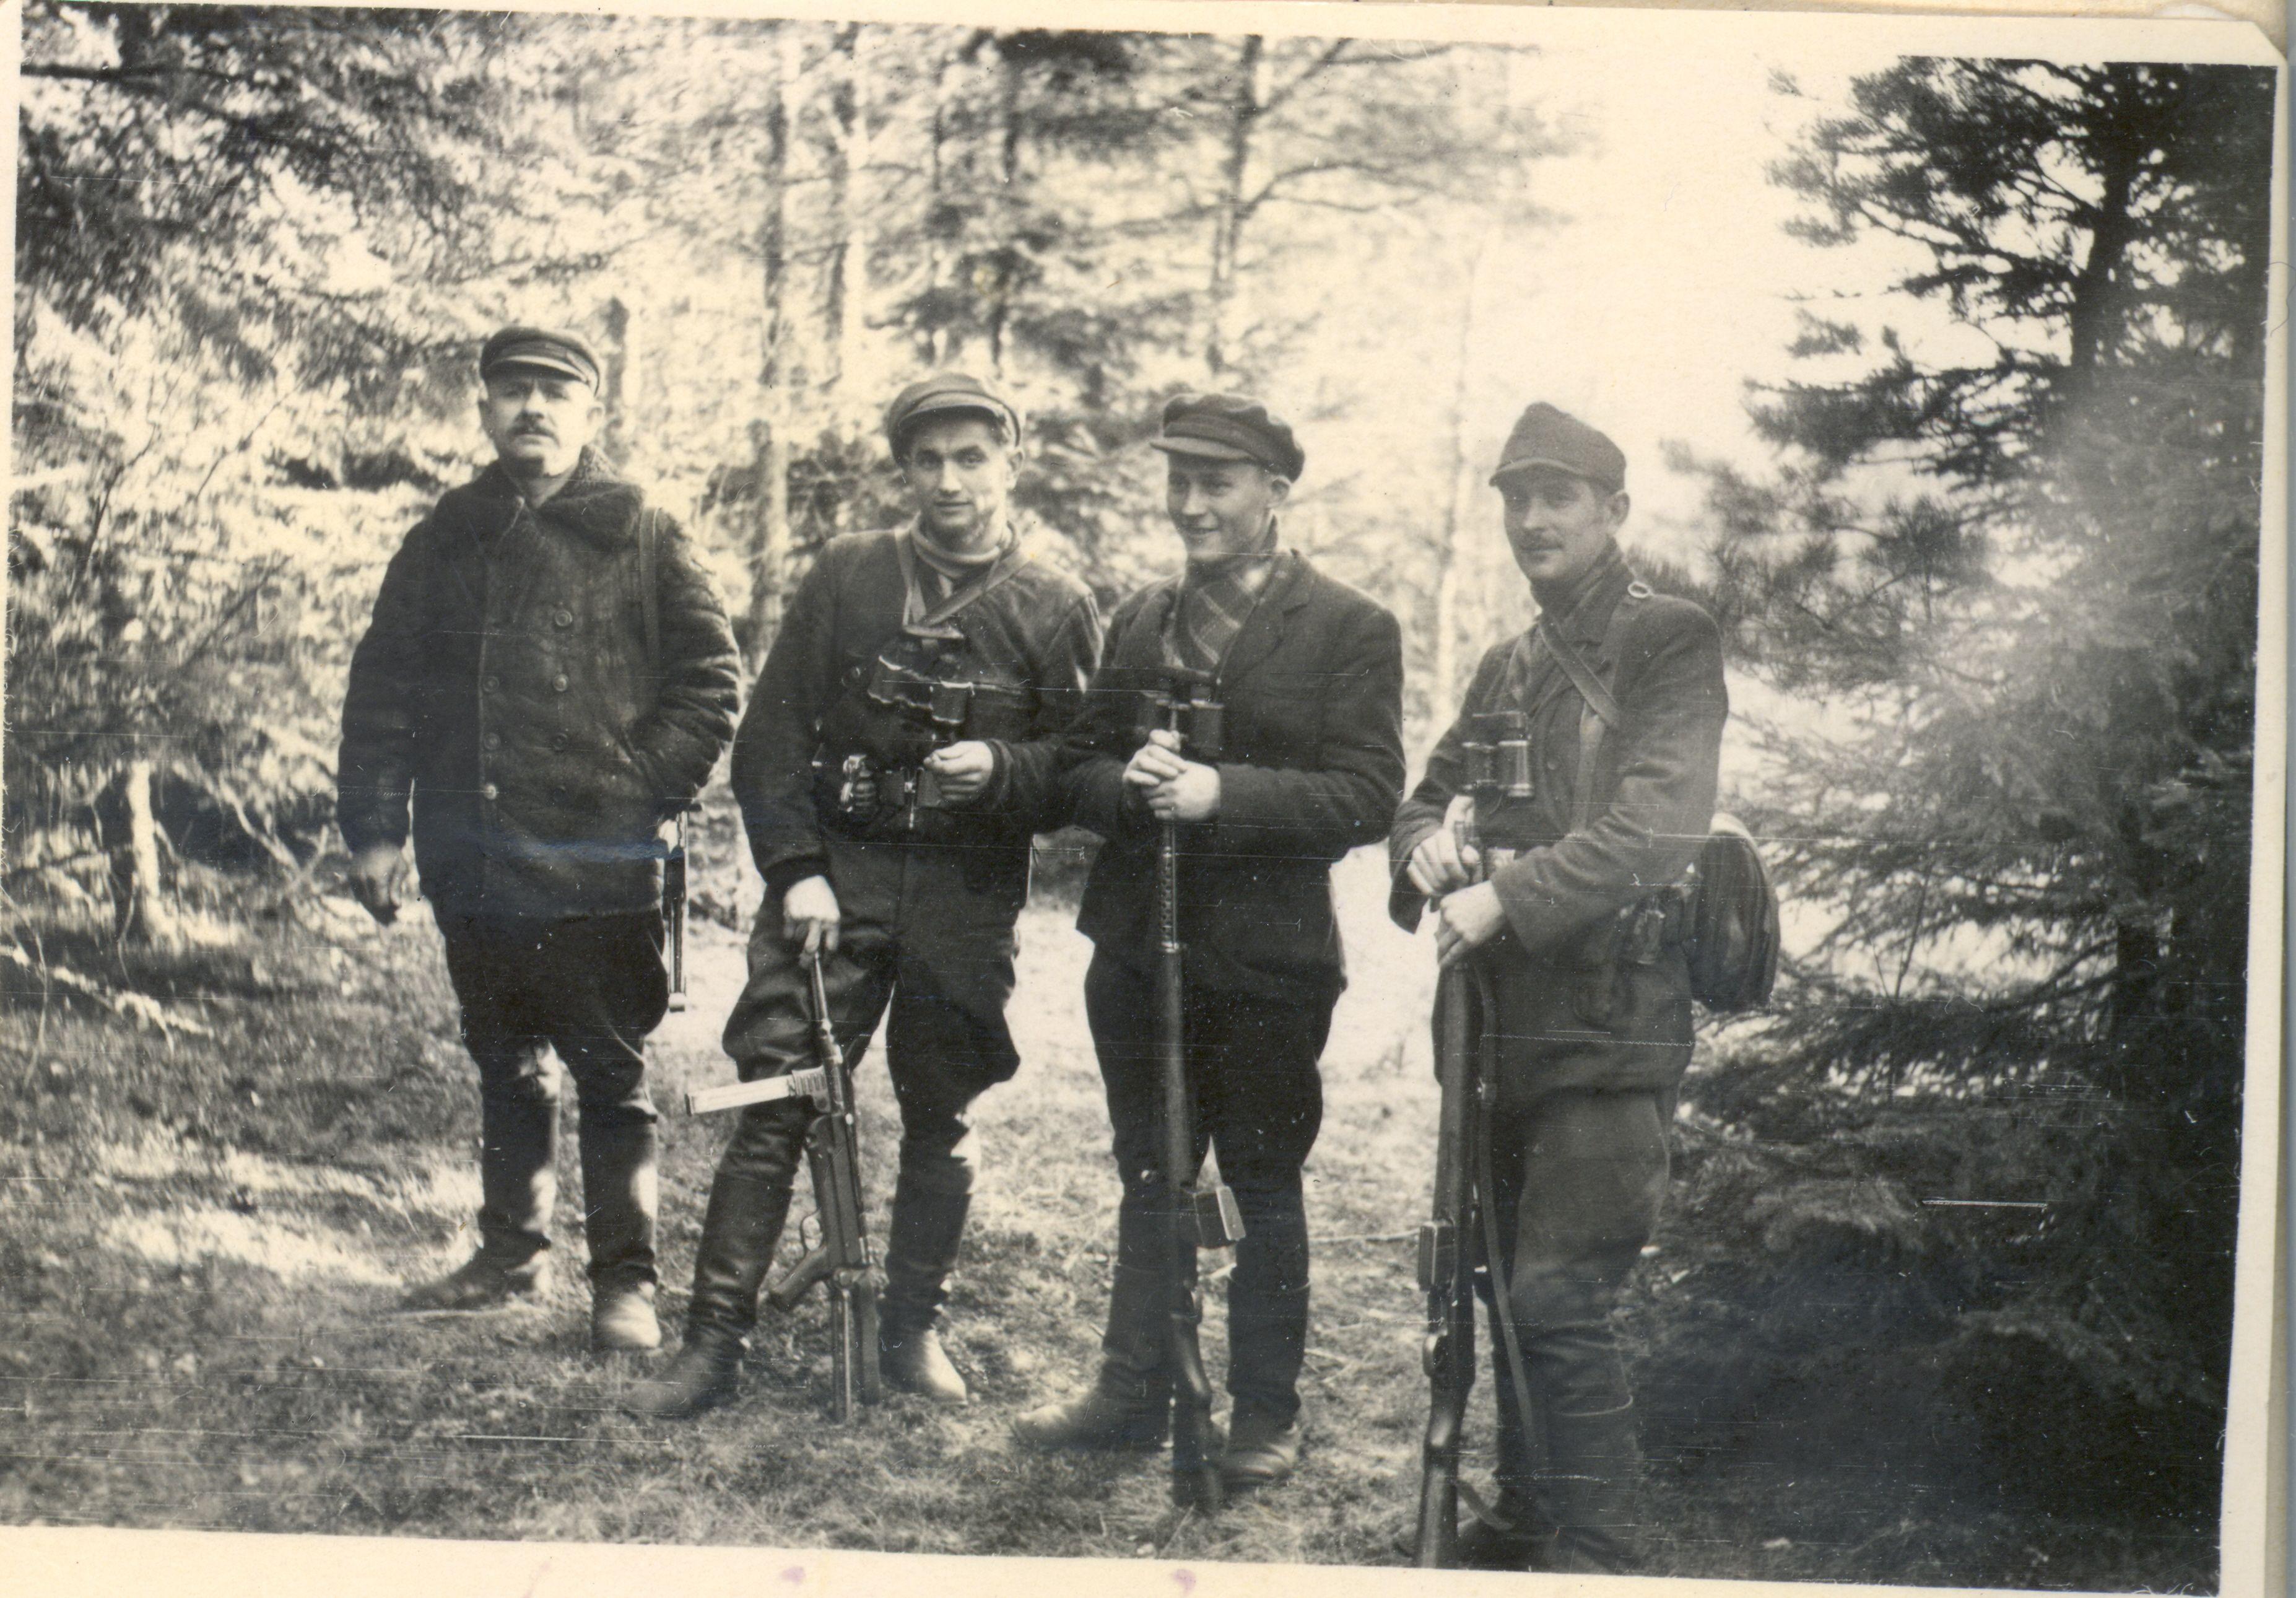 Pin by valdas ramonas on forest brothers civilian